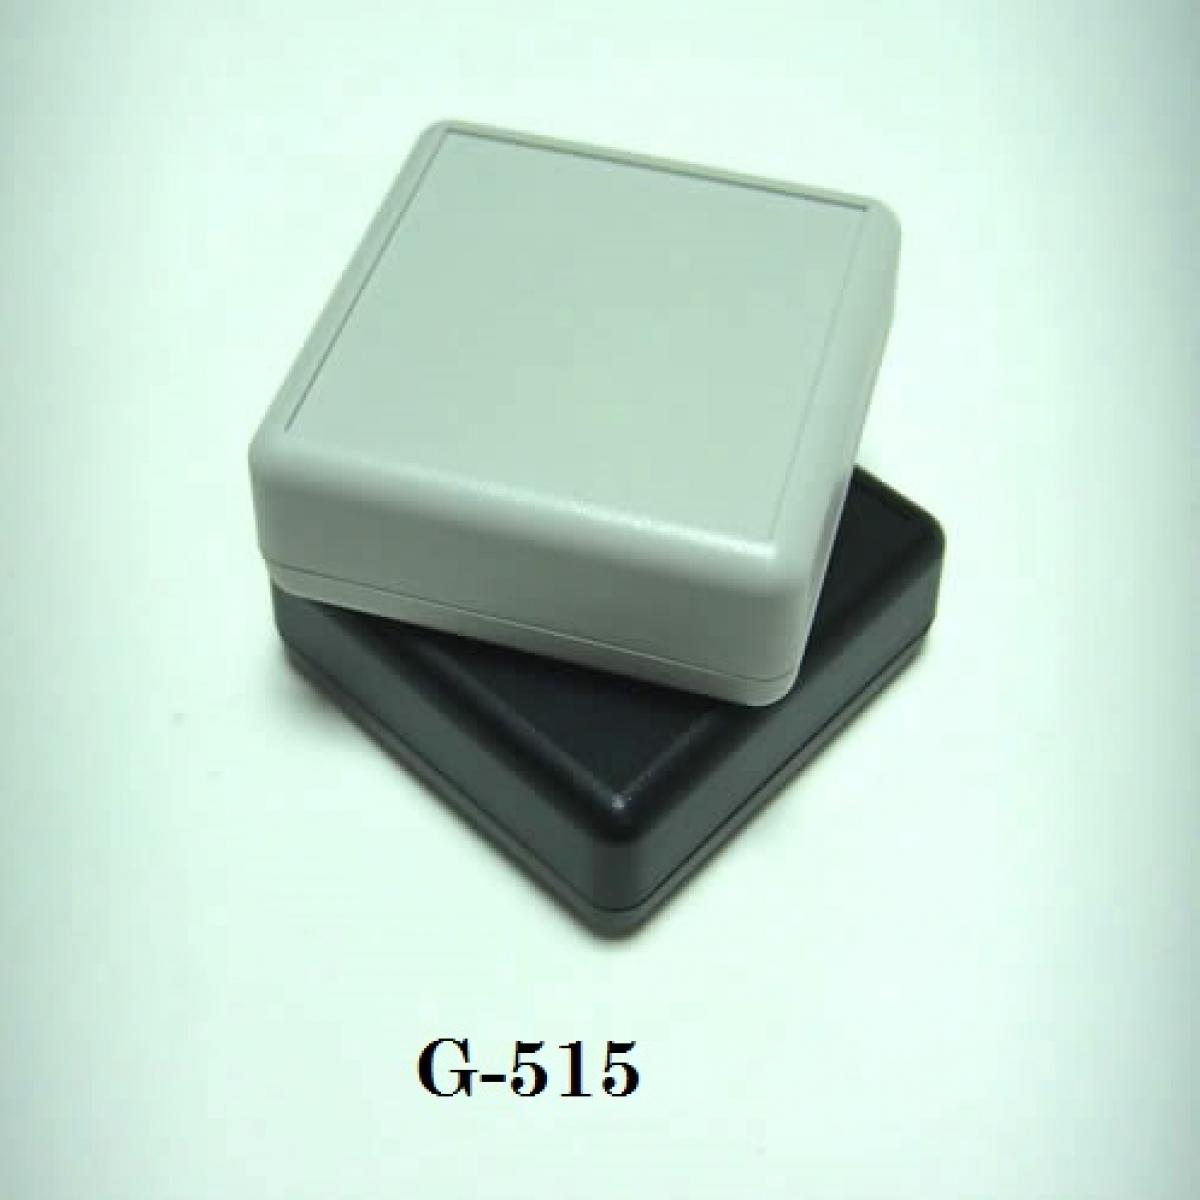 G-515